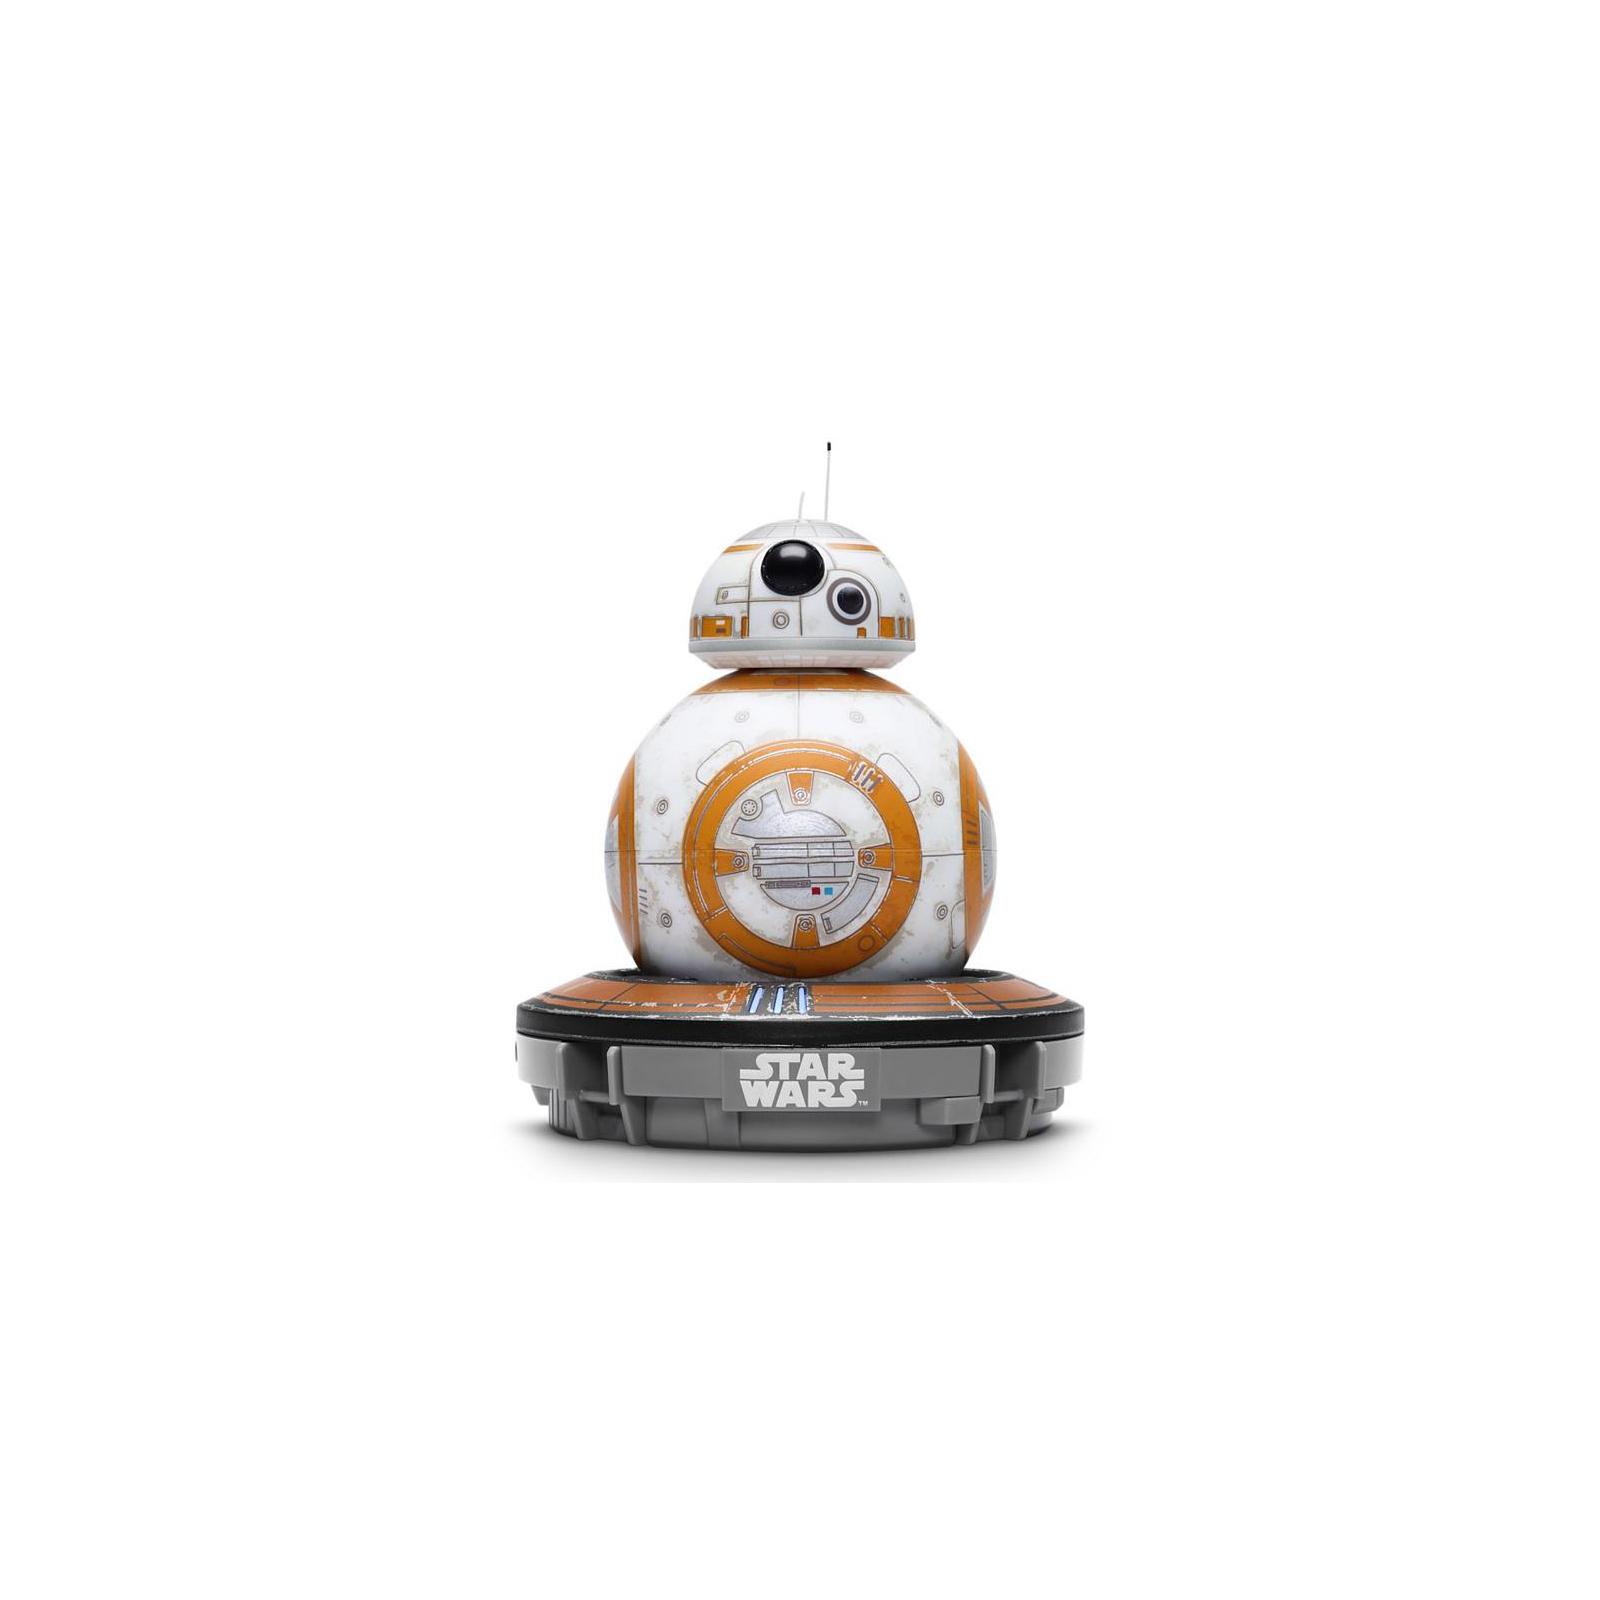 Робот Sphero BB-8 Special Edition with Force Band (322384) изображение 3